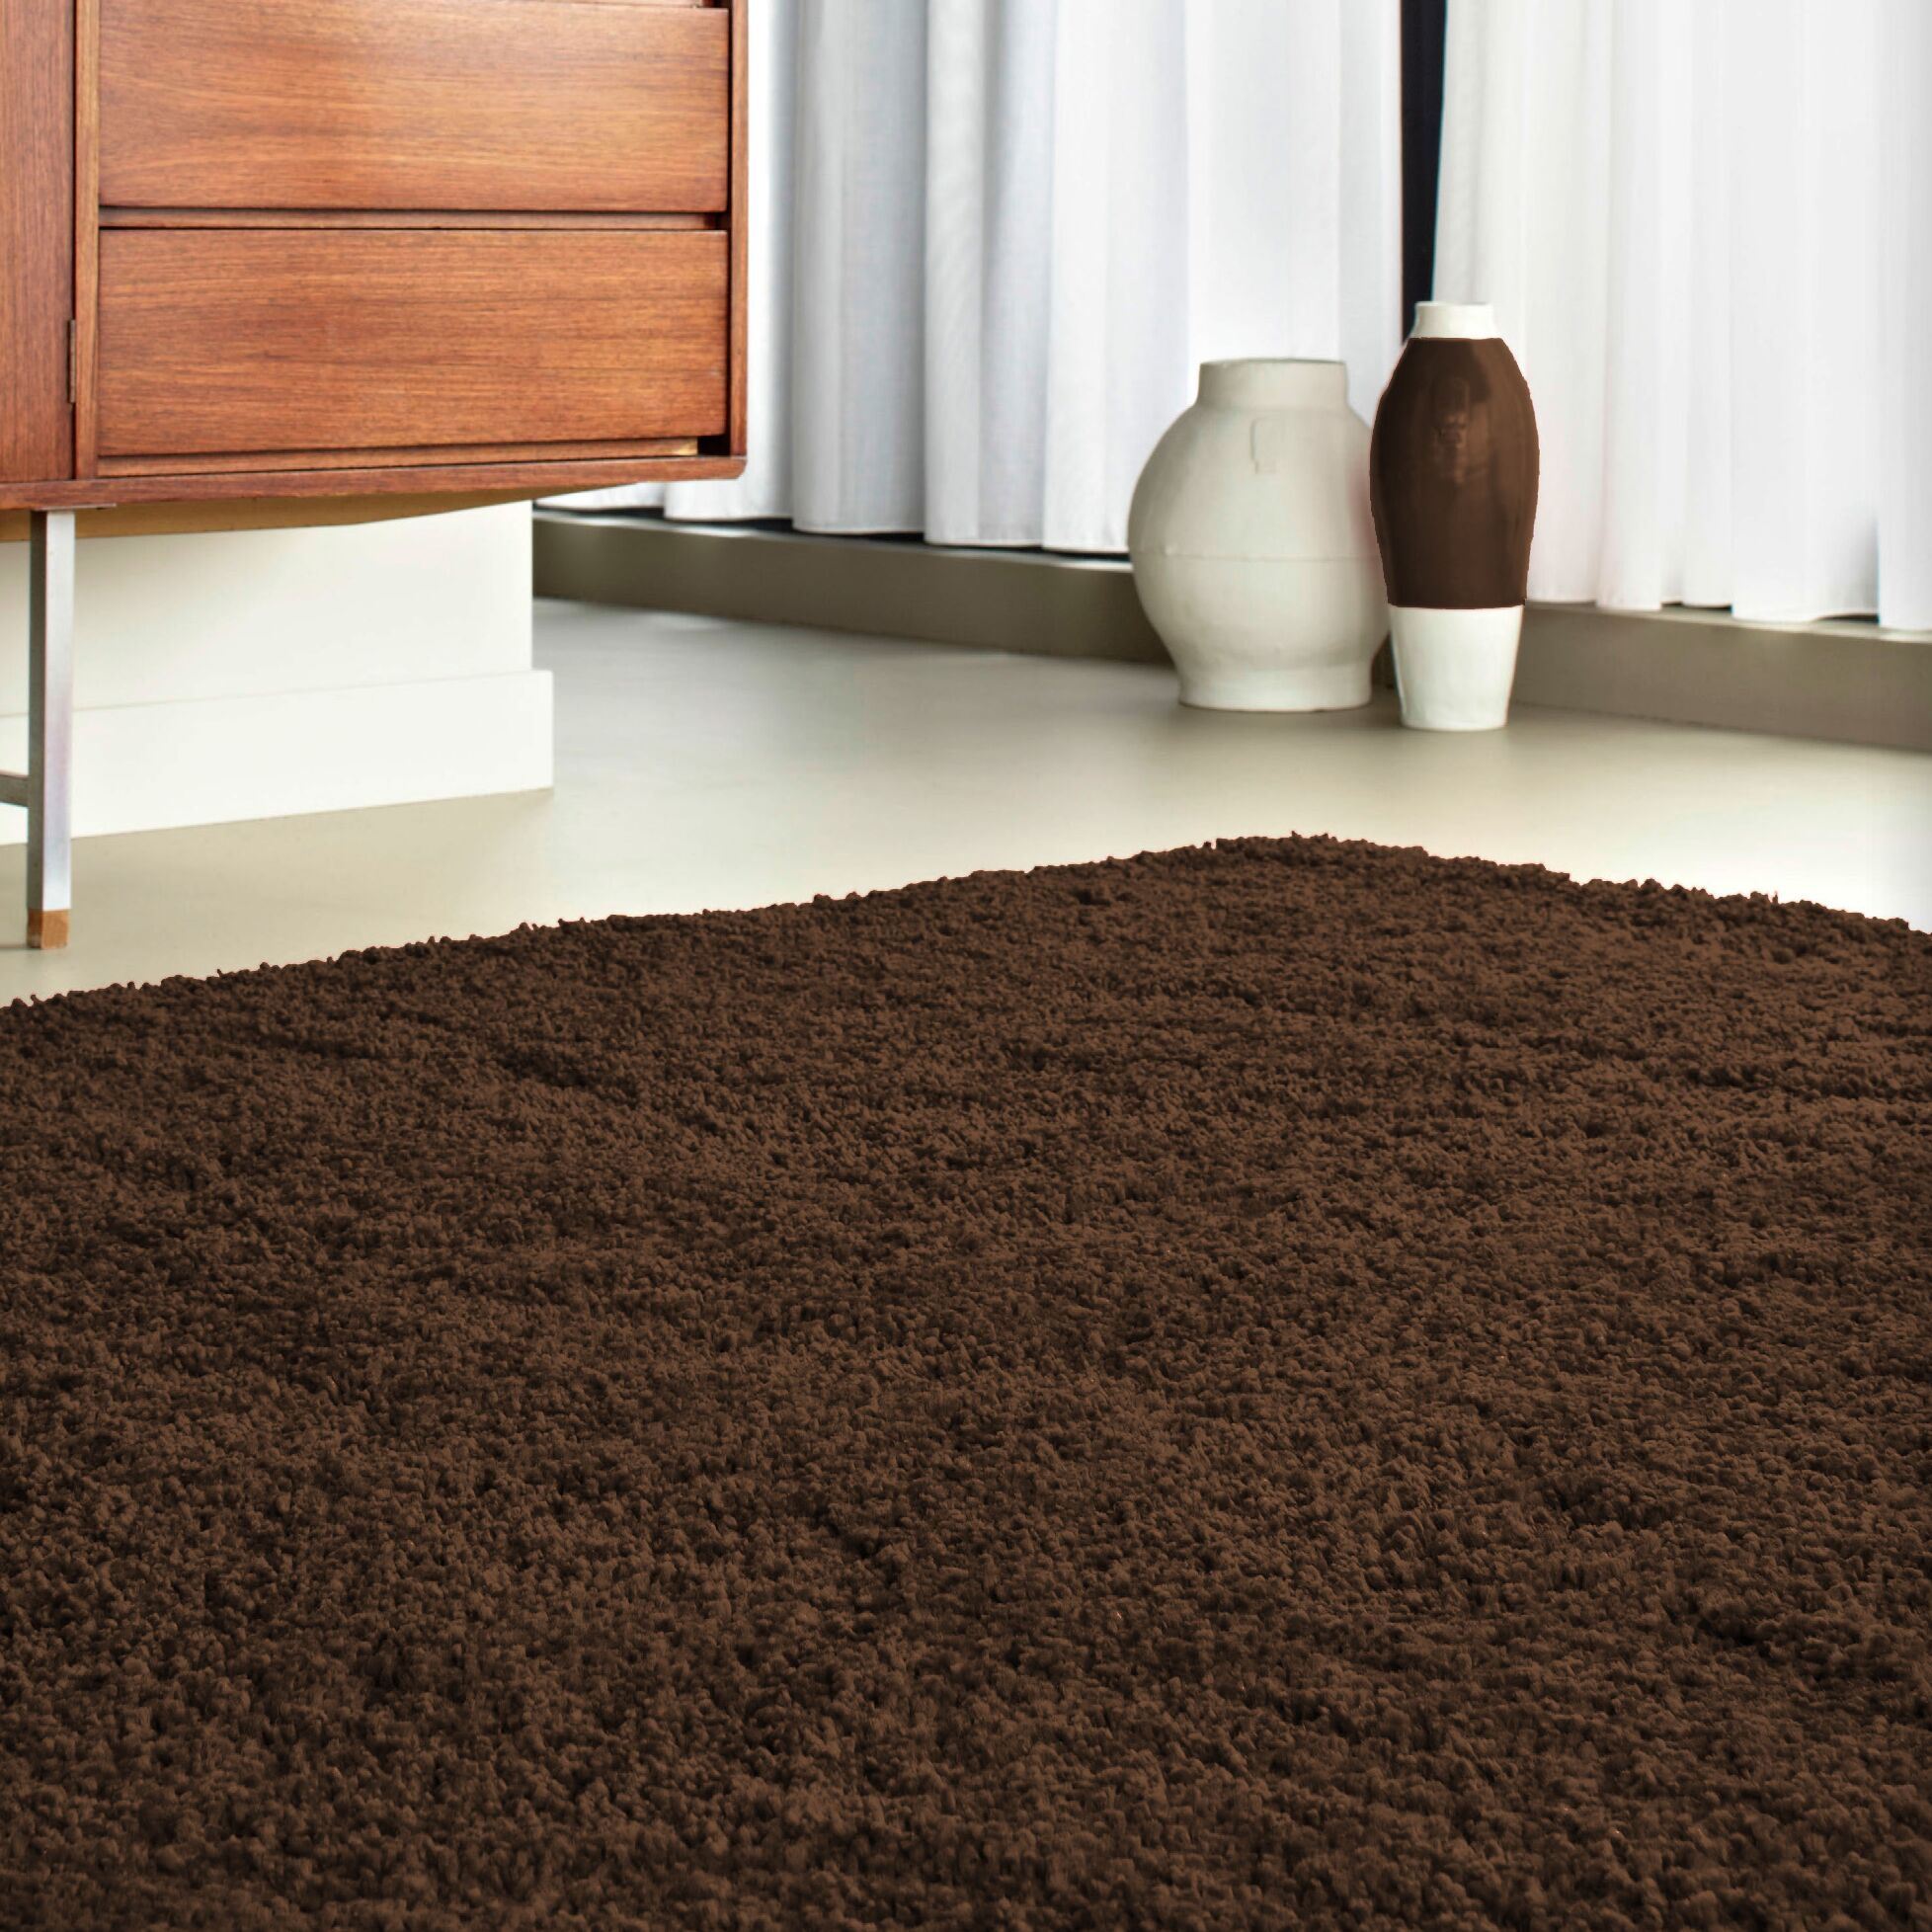 Logue Brown Area Rug Rug Size: 7'11